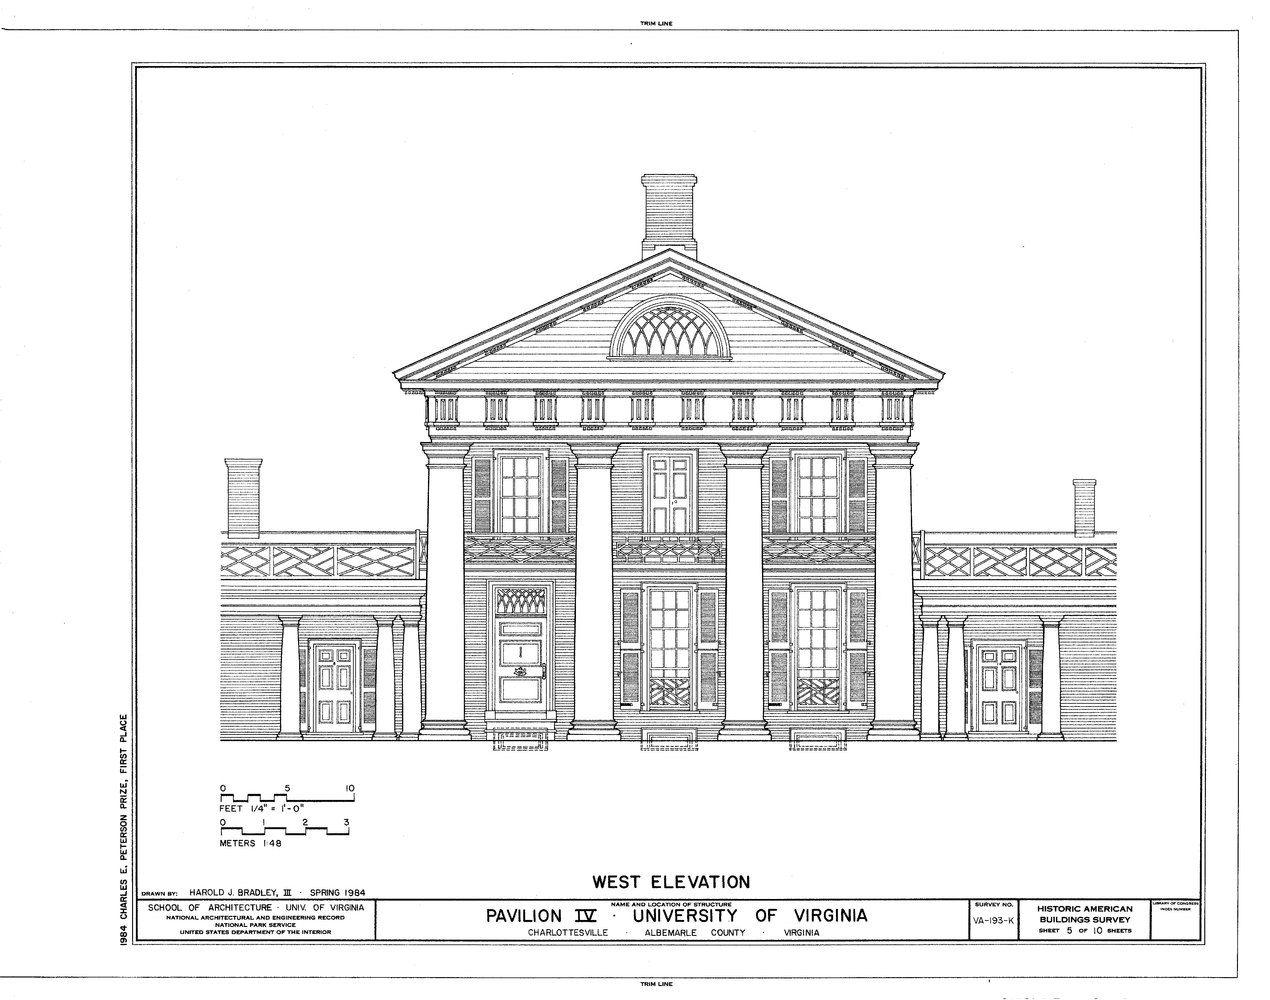 Gallery Of Ad Classics University Of Virginia Thomas Jefferson 2 Thomas Jefferson University Of Virginia Architecture Blueprints